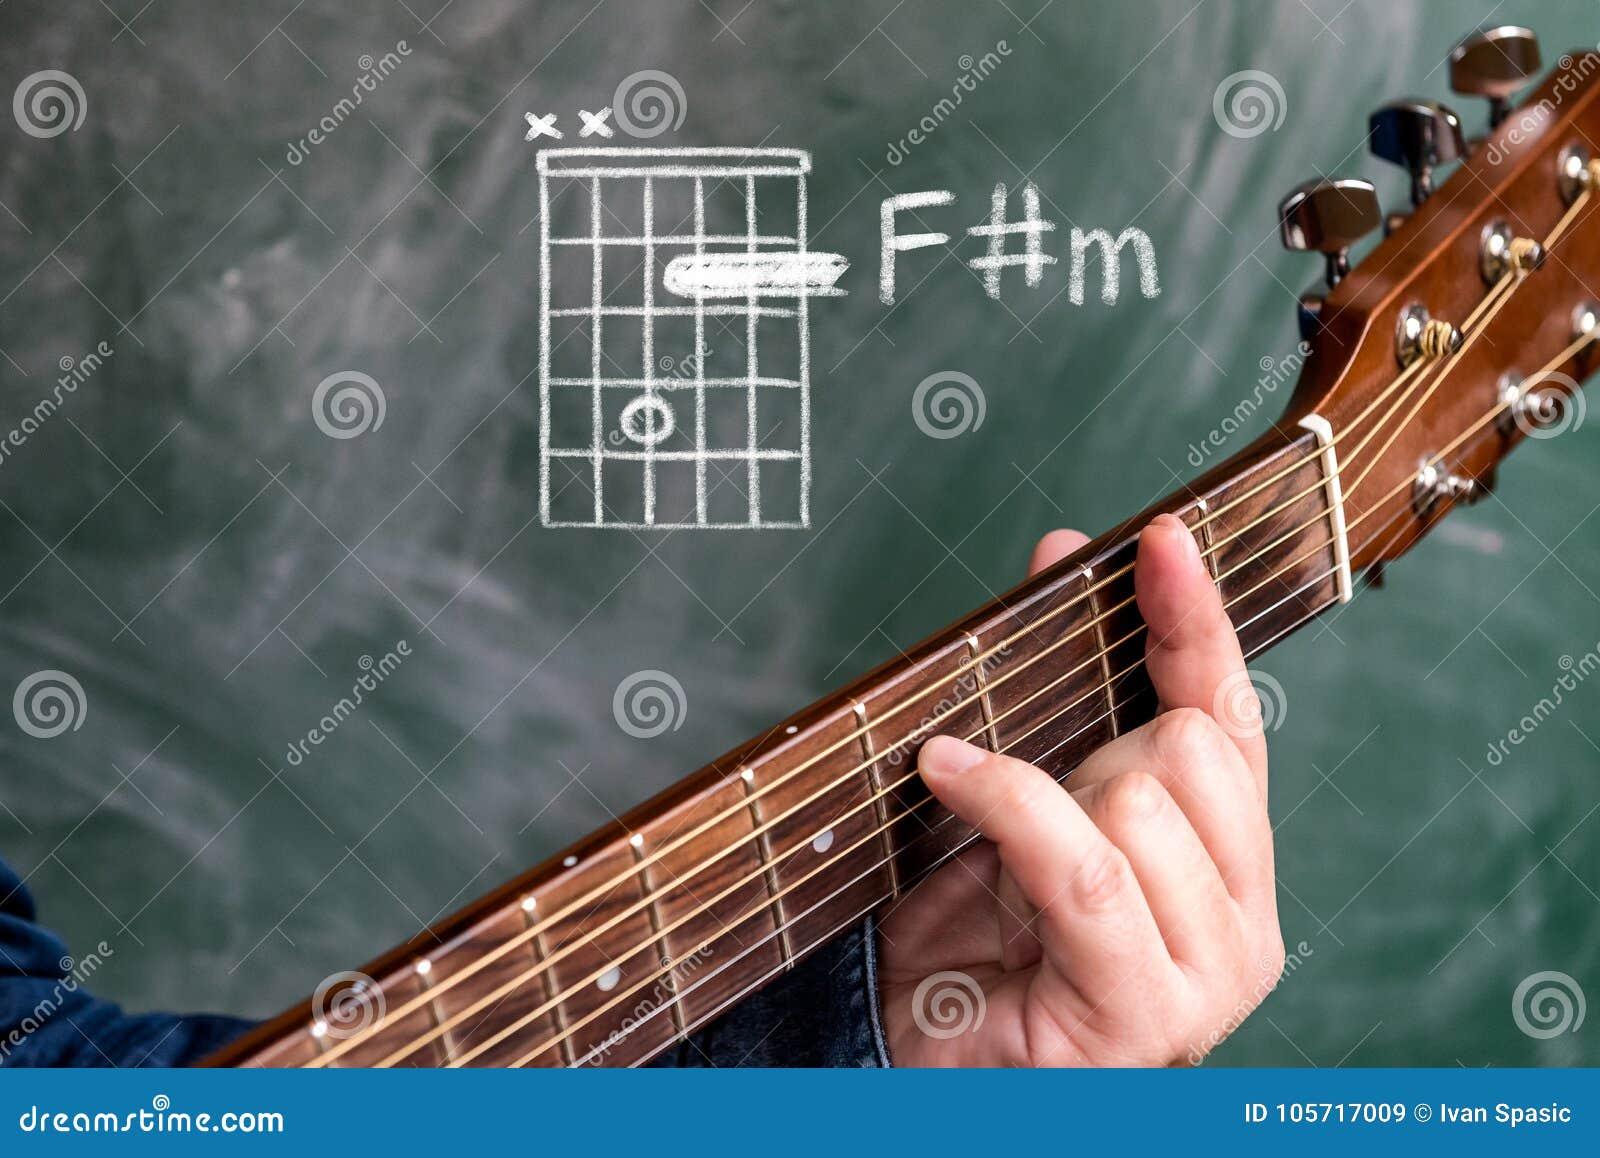 Man Playing Guitar Chords Displayed On A Blackboard Chord F Sharp